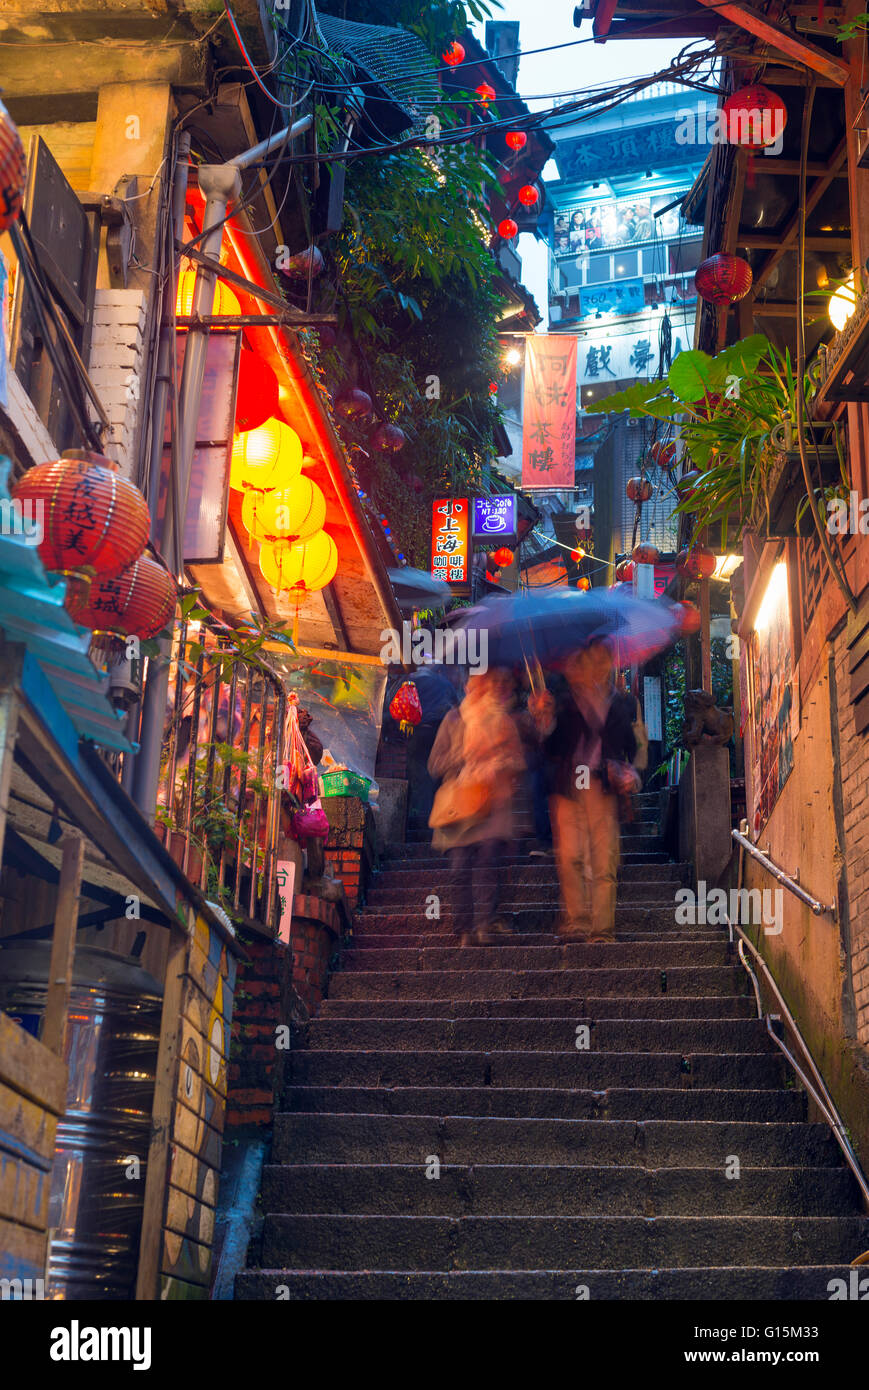 Tea houses, Jiufen, Taiwan, Asia - Stock Image